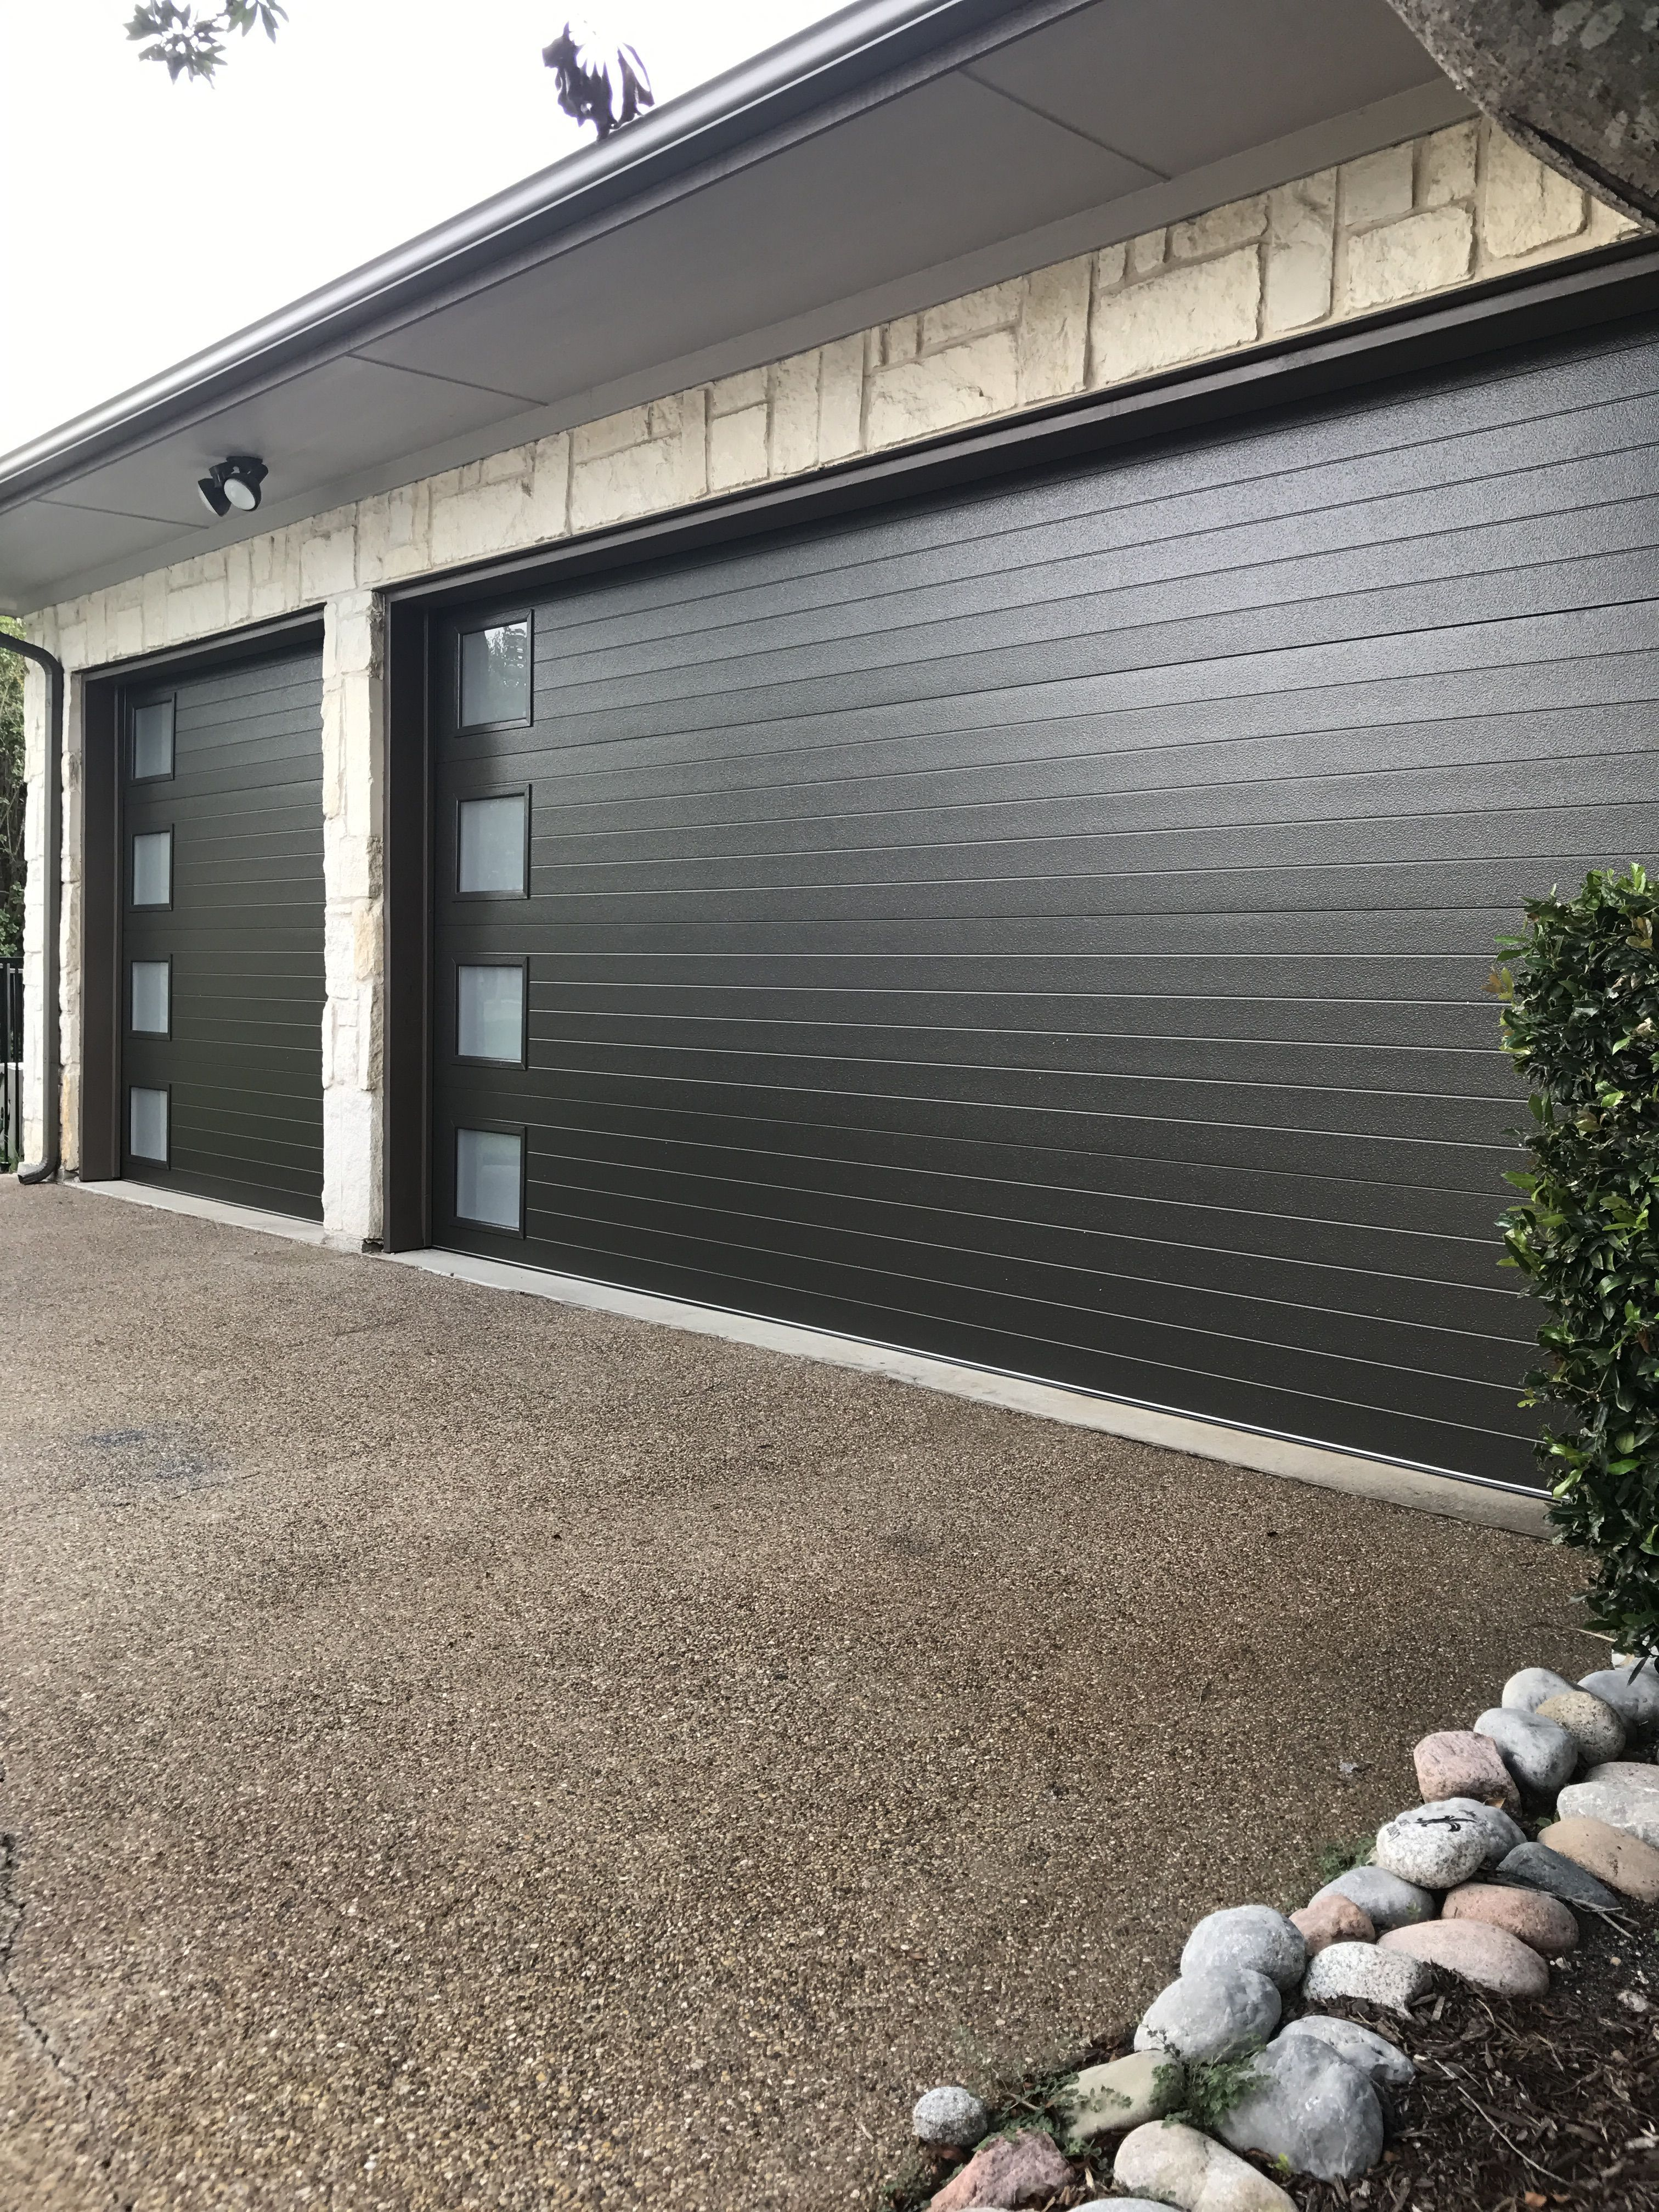 Clopay Modern Steel Series Clopay Doors In 2019 Garage Garage Doors Garage Door Styles Garage Door Types